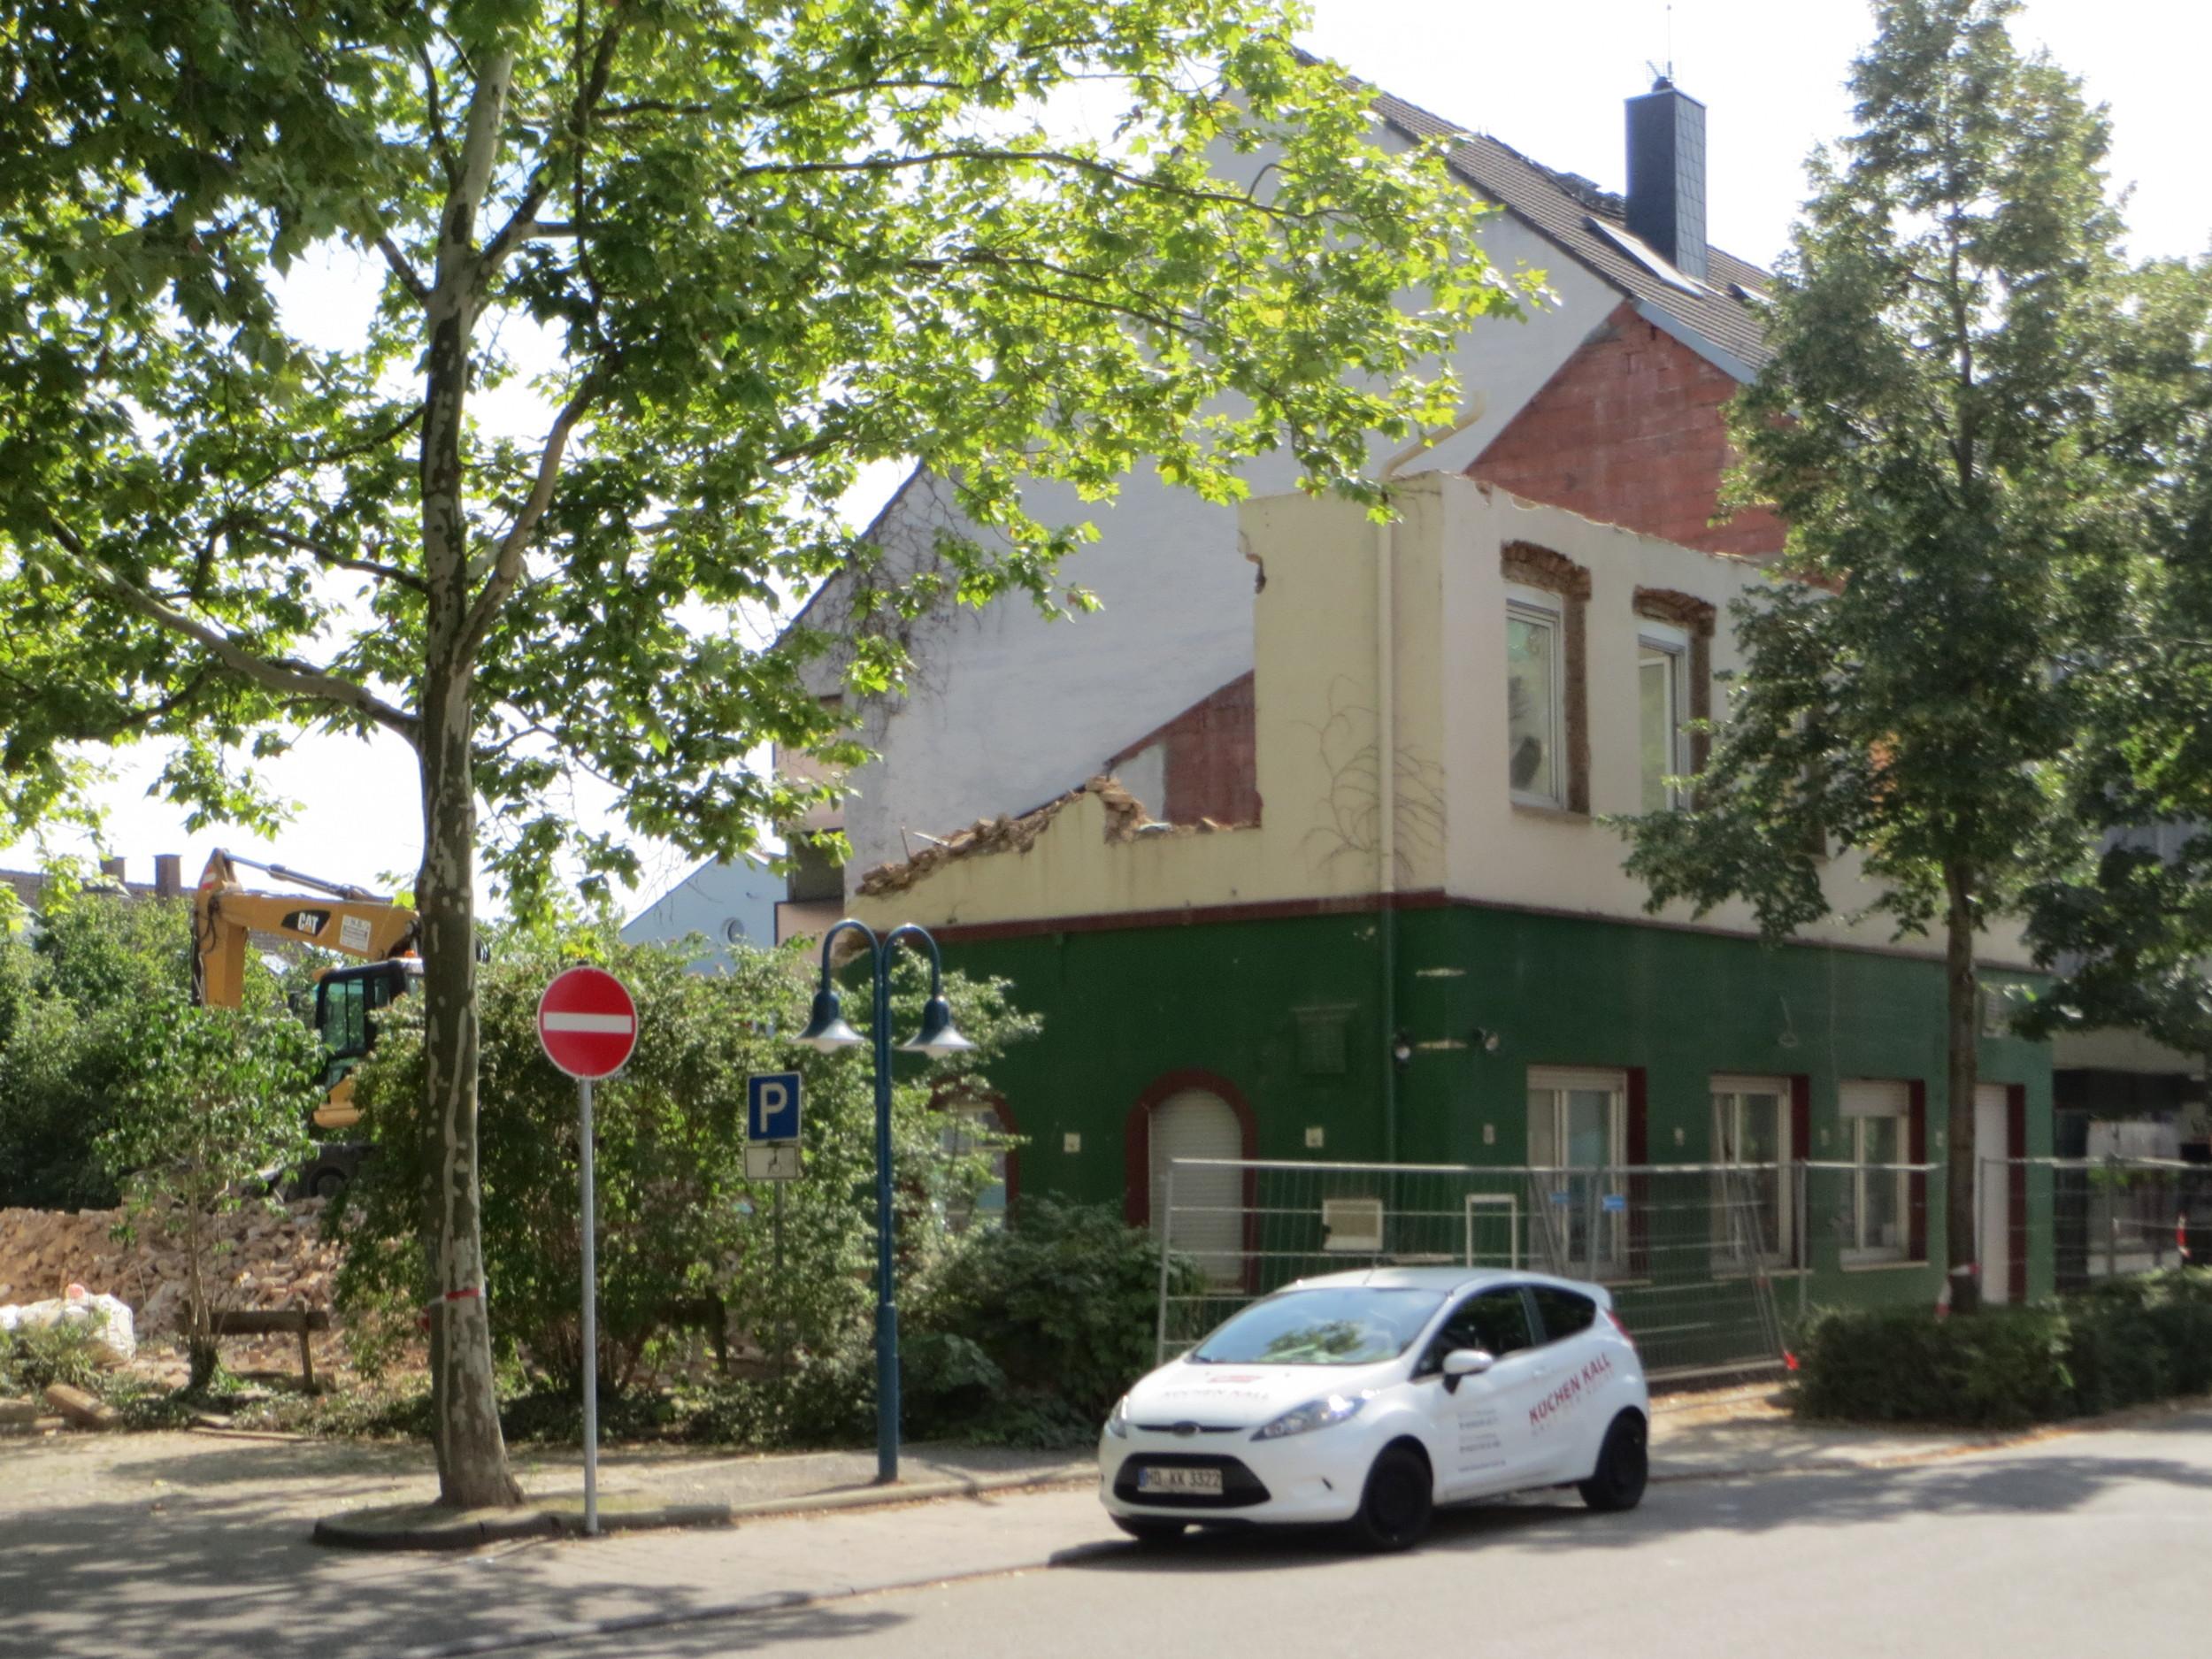 File:20140719Alte Stadtschaenke Hockenheim1.jpg - Wikimedia Commons